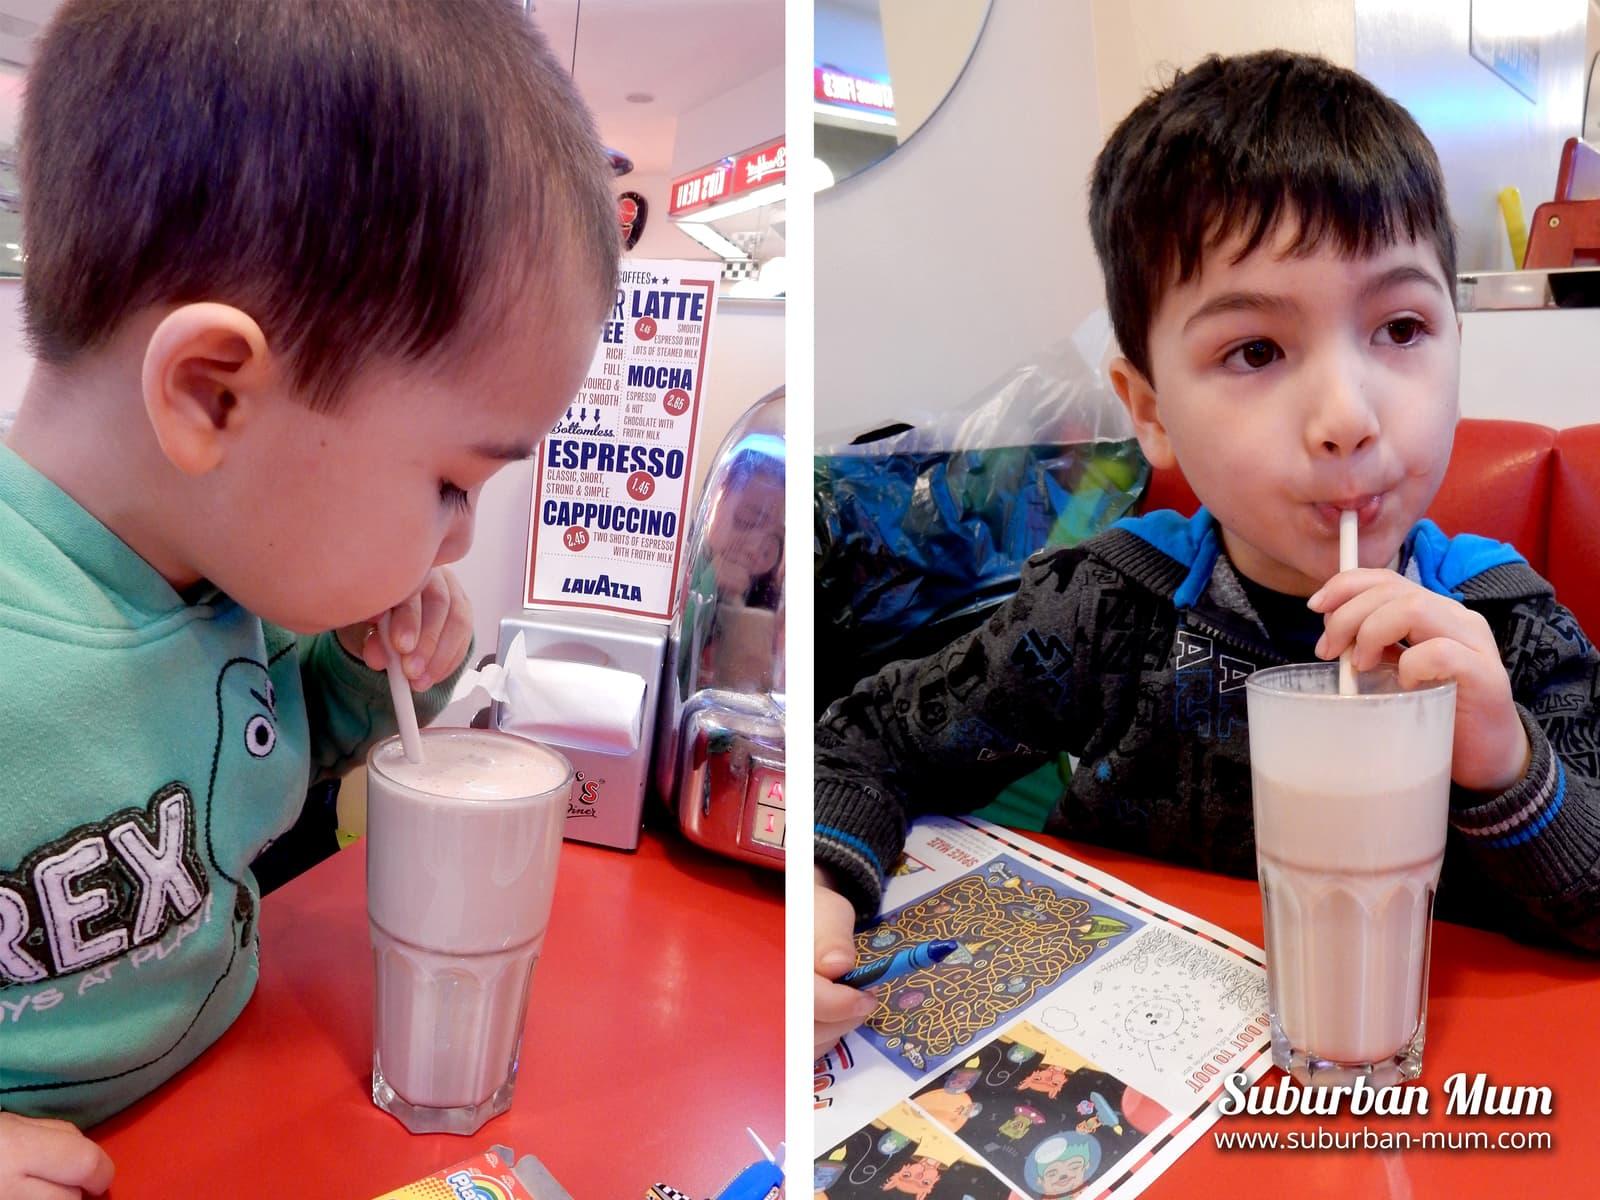 eds-diner-milkshakes